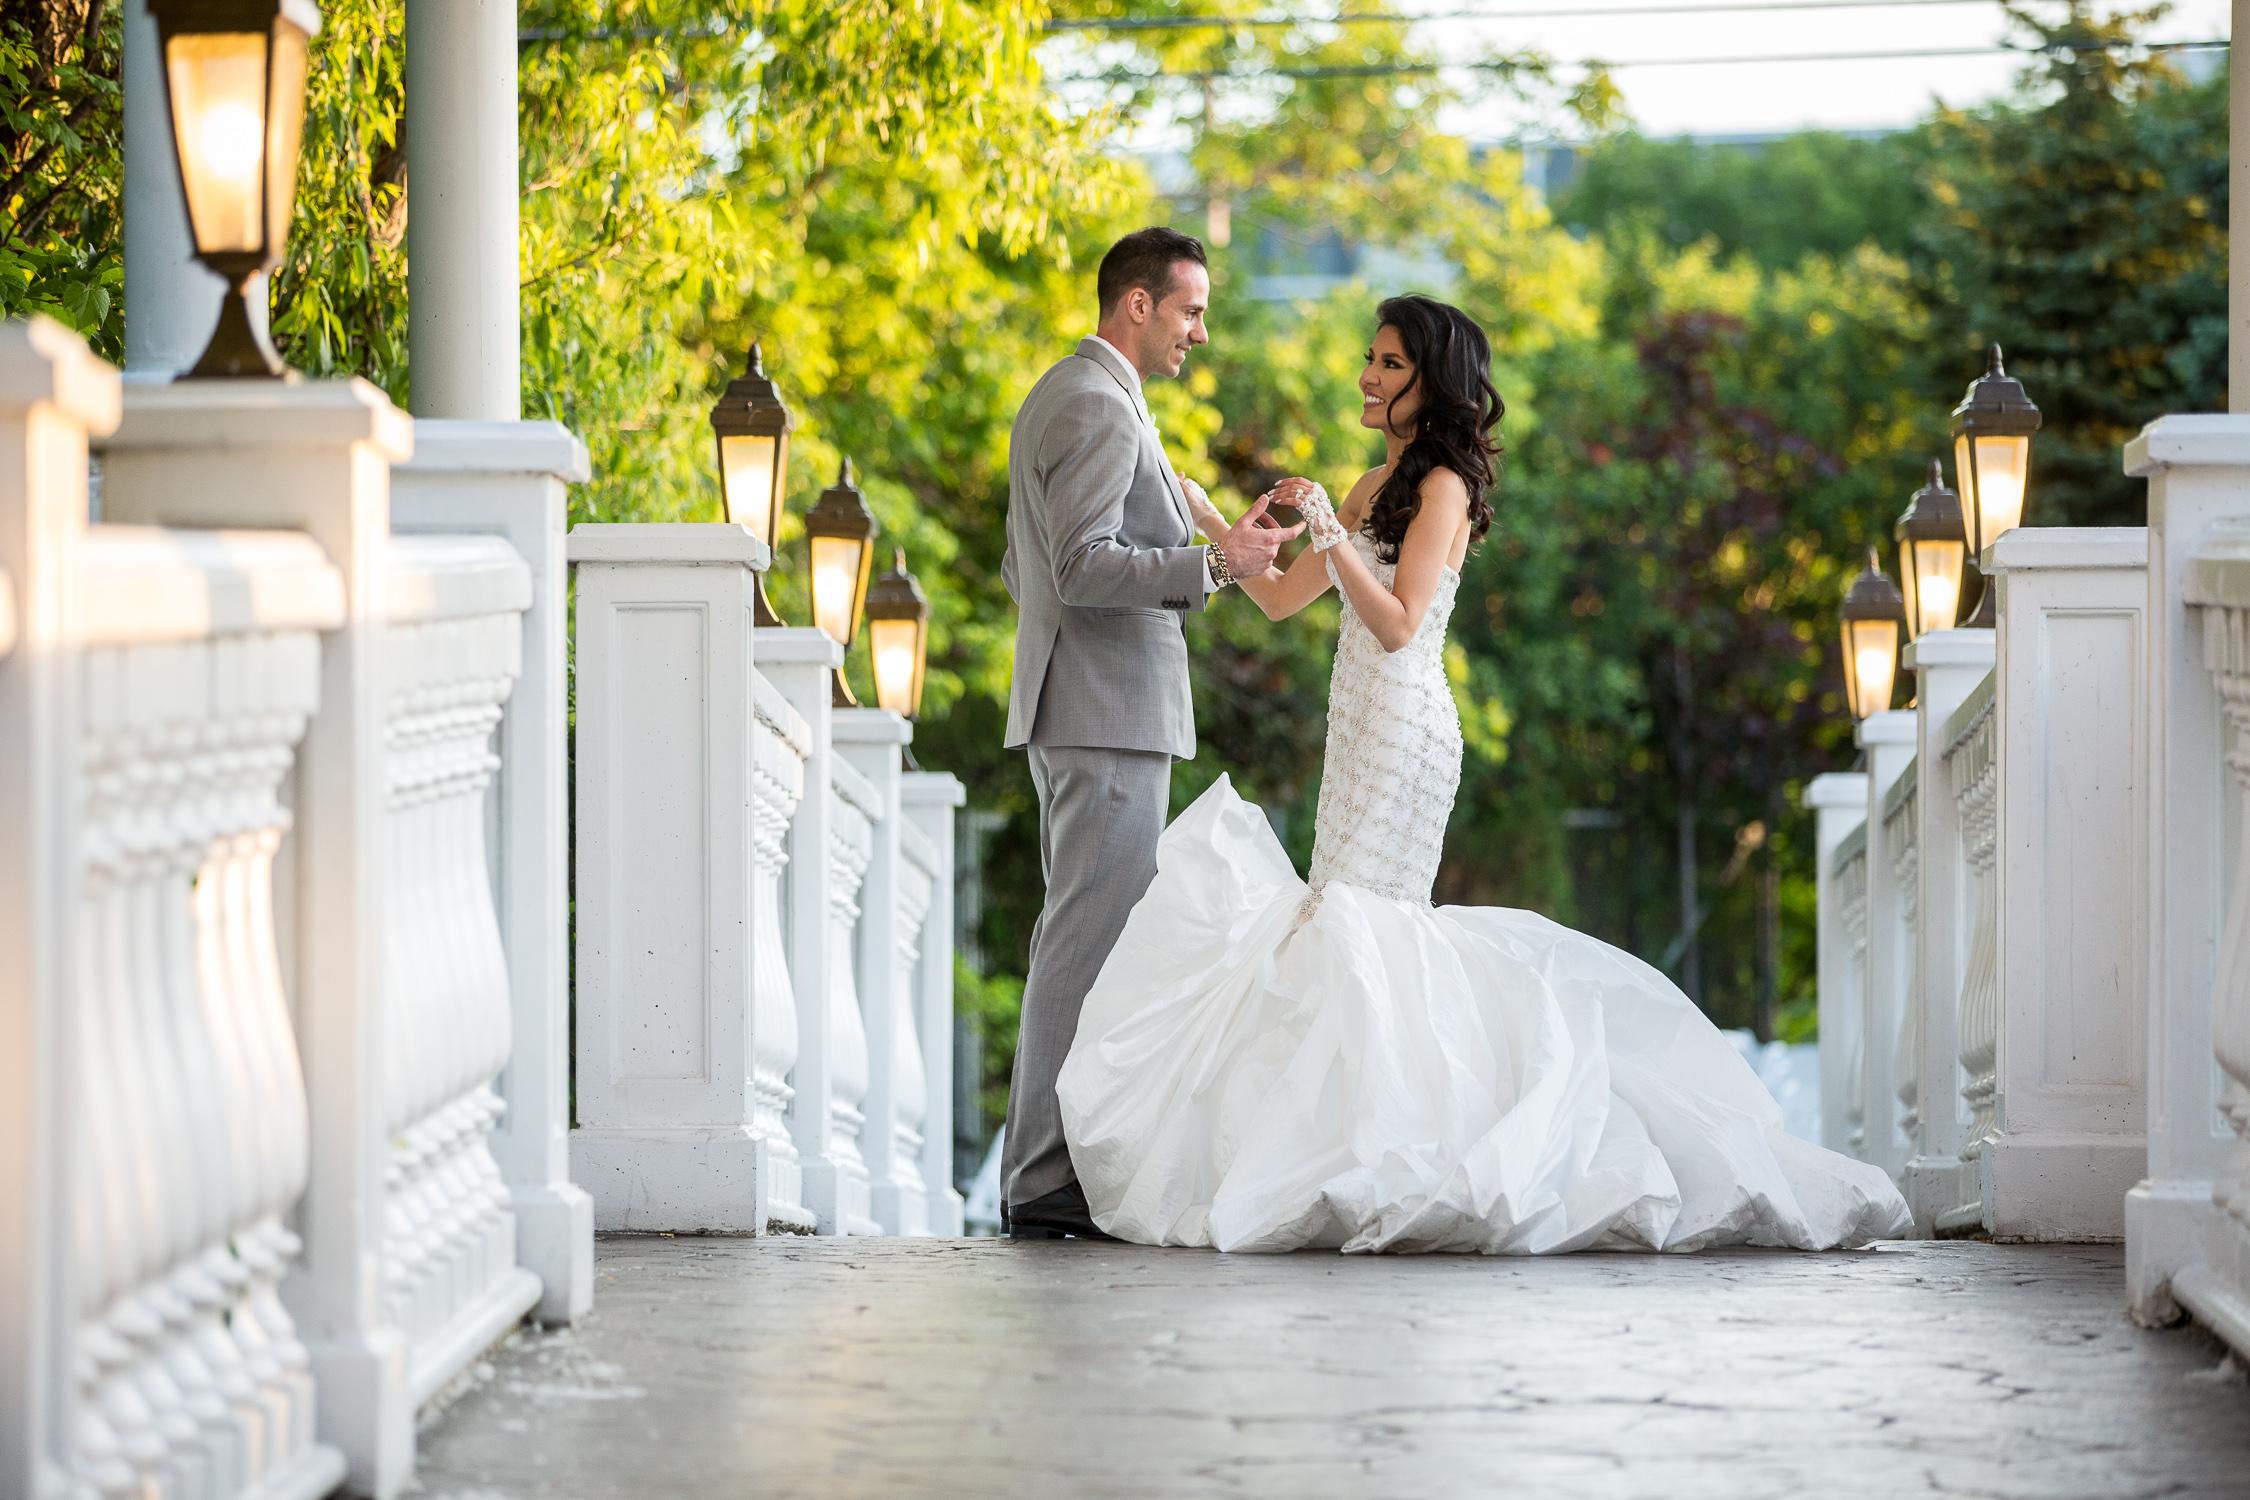 Paradise-Banquet-Hall-Wedding-Vaughan-Ontario-0082.jpg